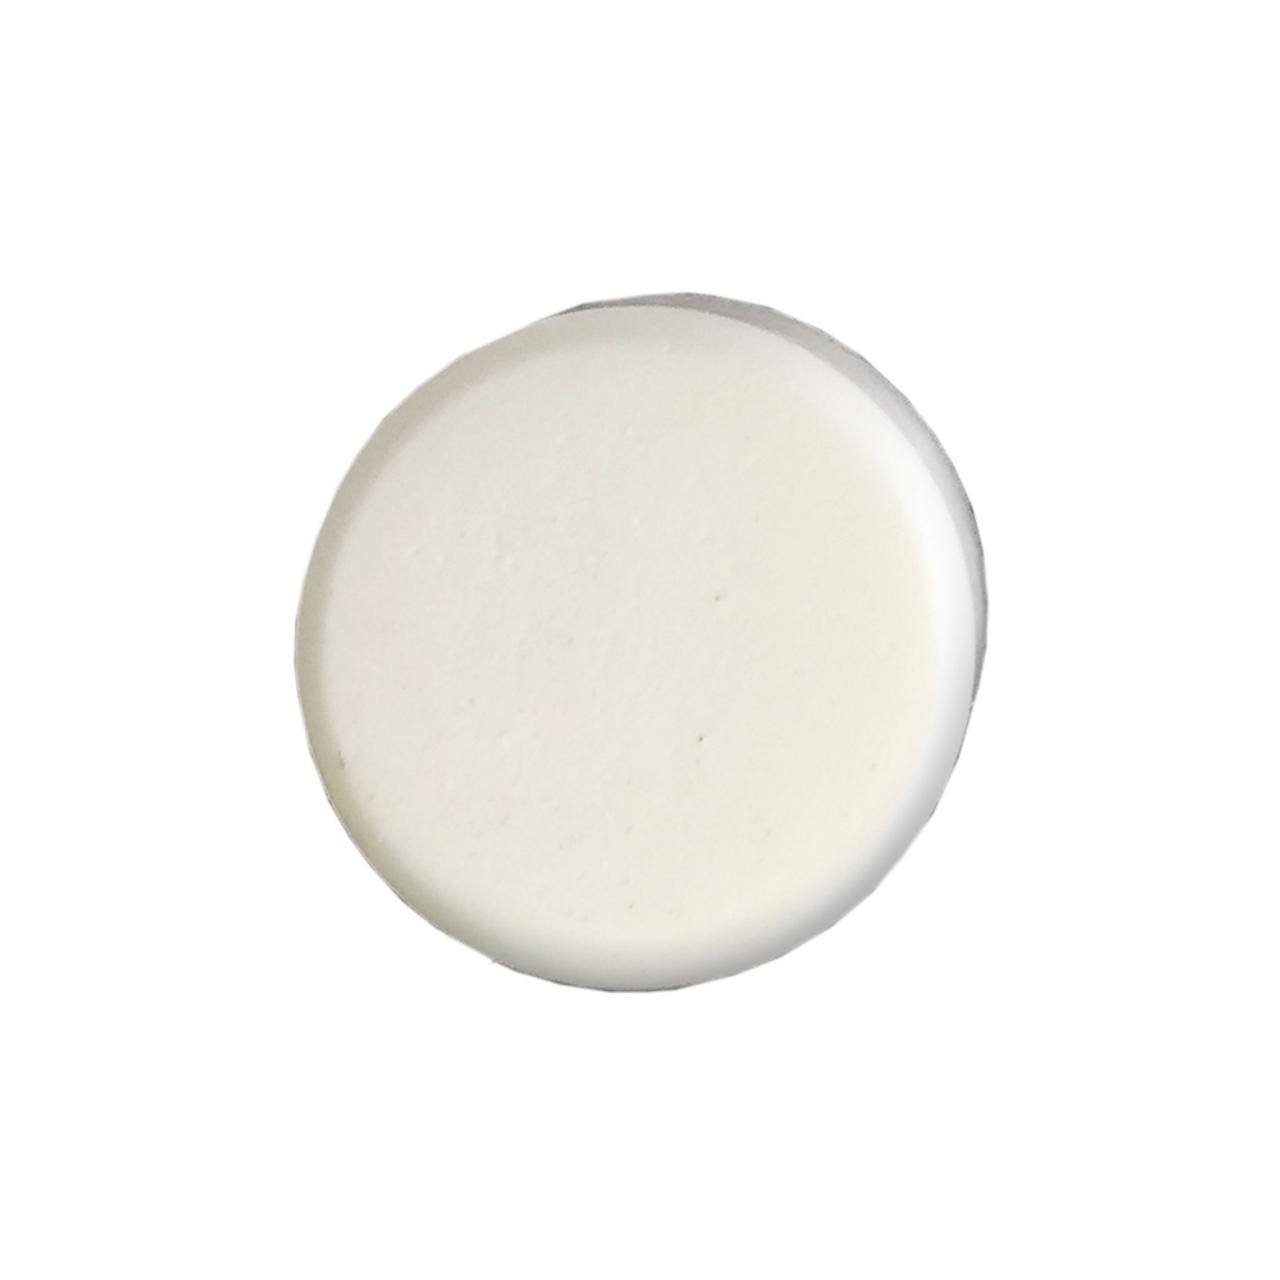 Laguna - Ceramic Replacments : Rectangular Fits HD Models (650434694476)